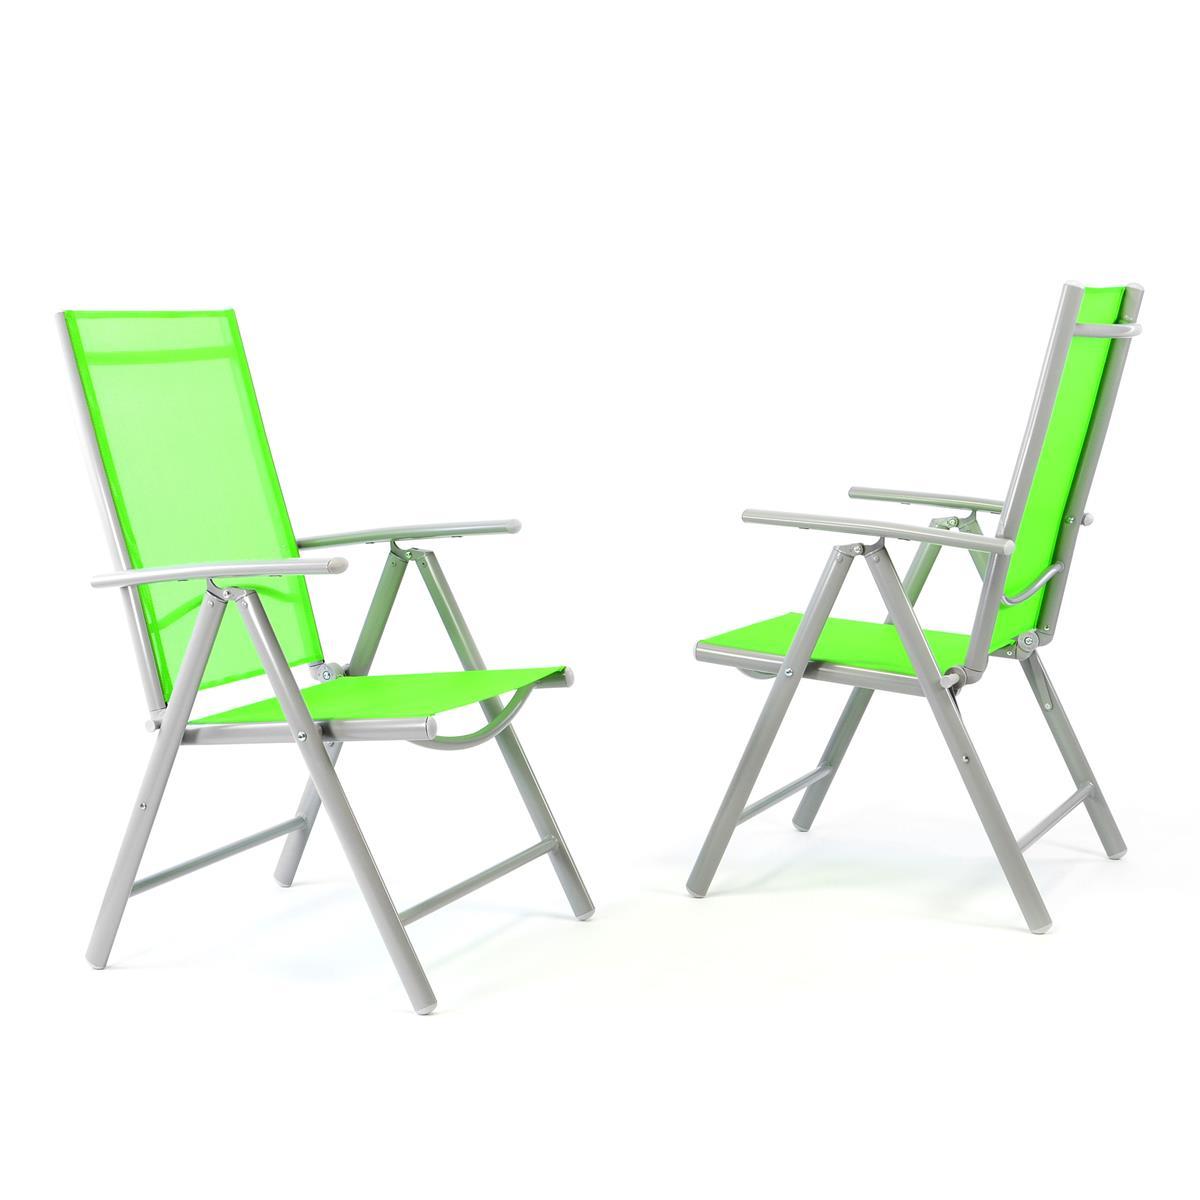 2er Set Klappstuhl grün Komfortbreite -Klappsessel Gartenstuhl Campingstuhl